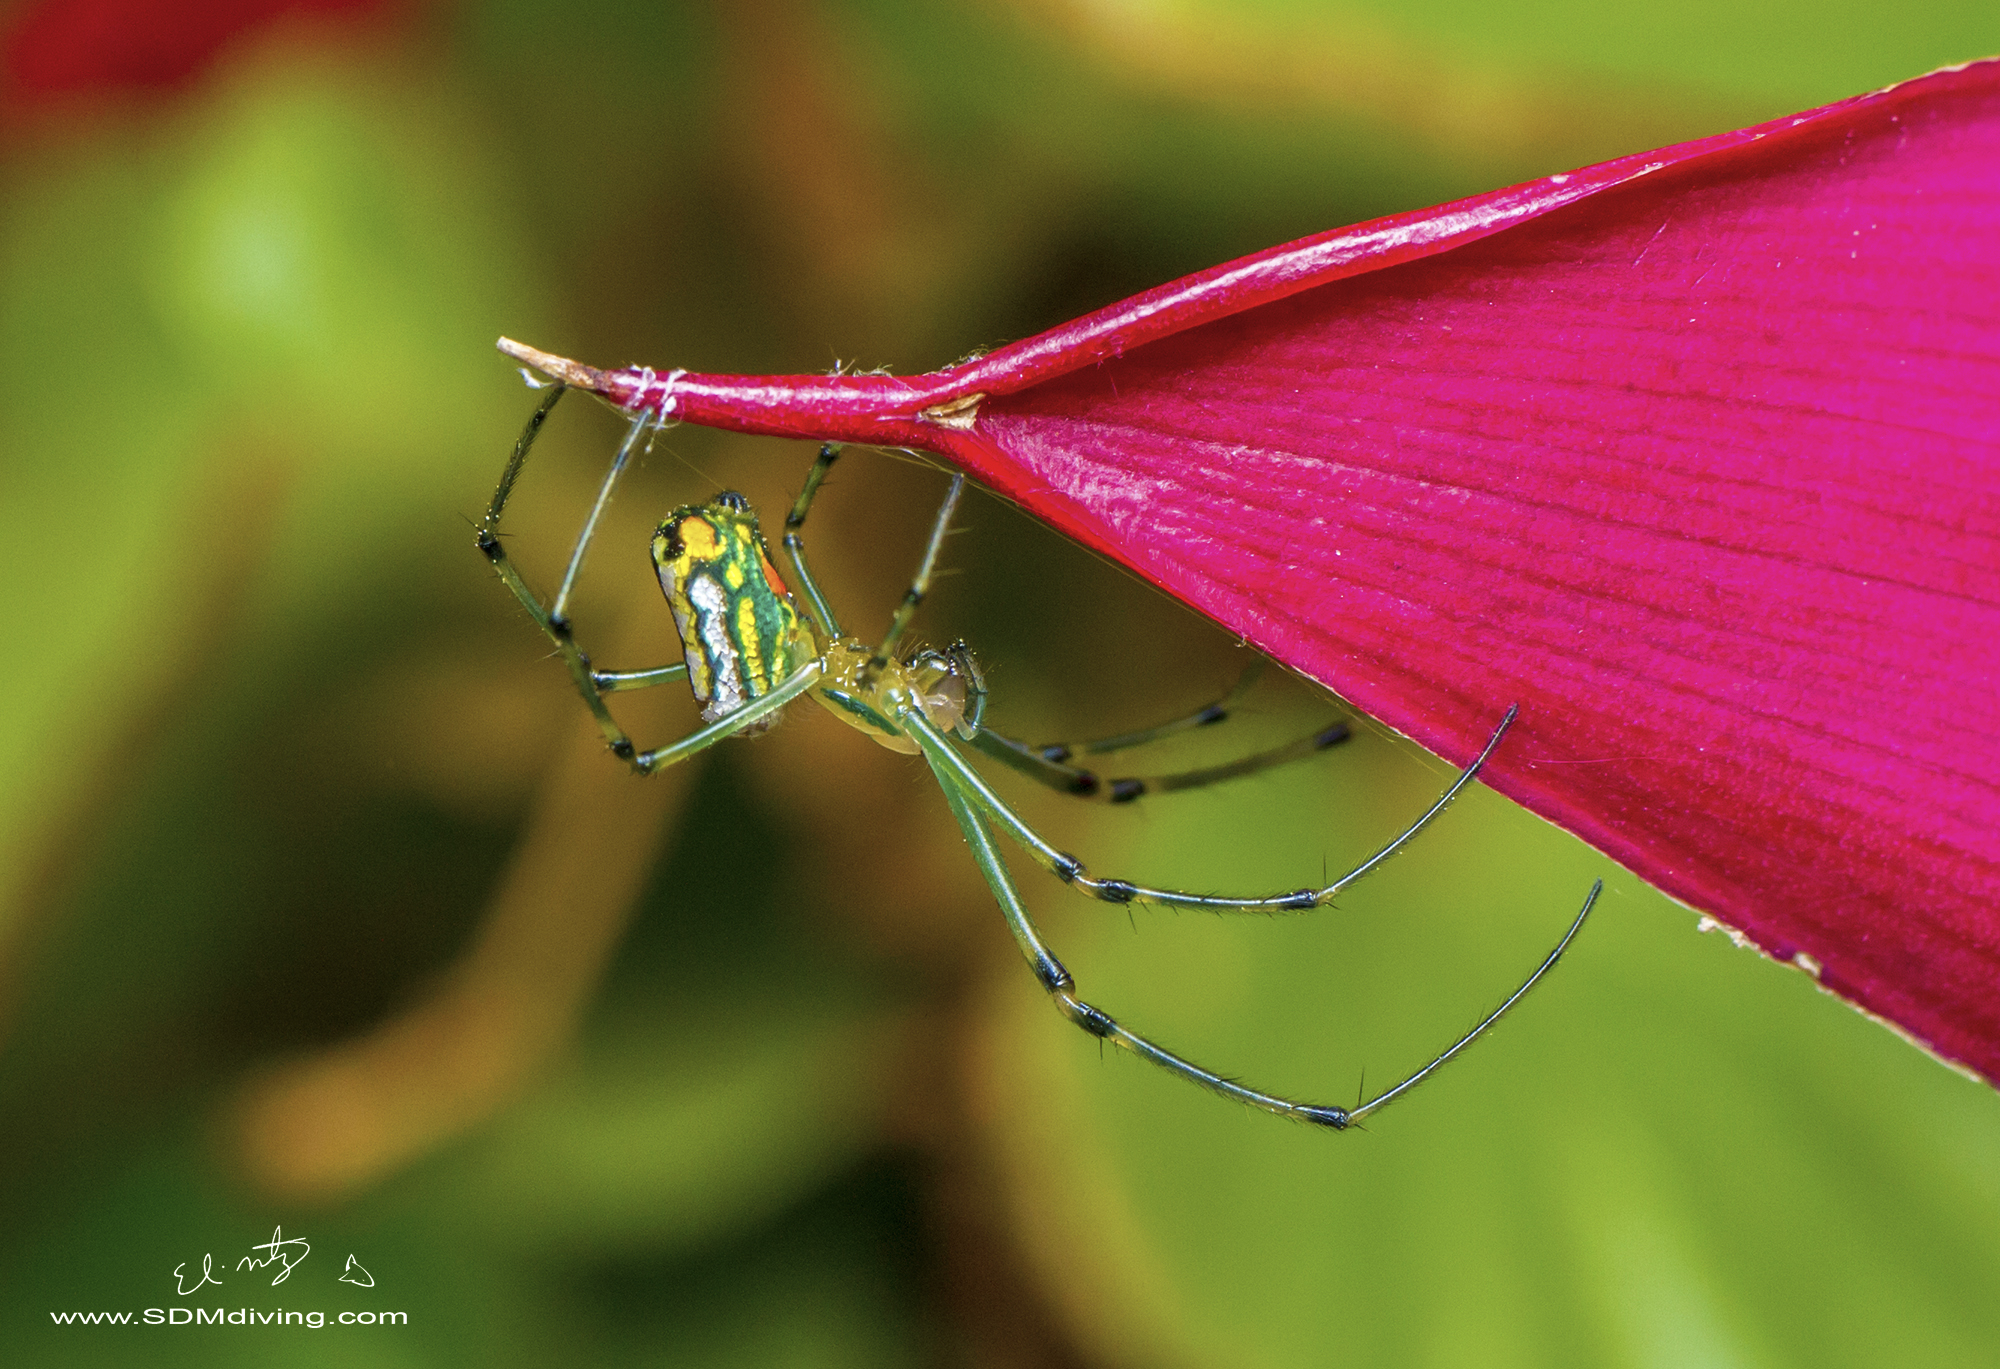 7. Orchard spider